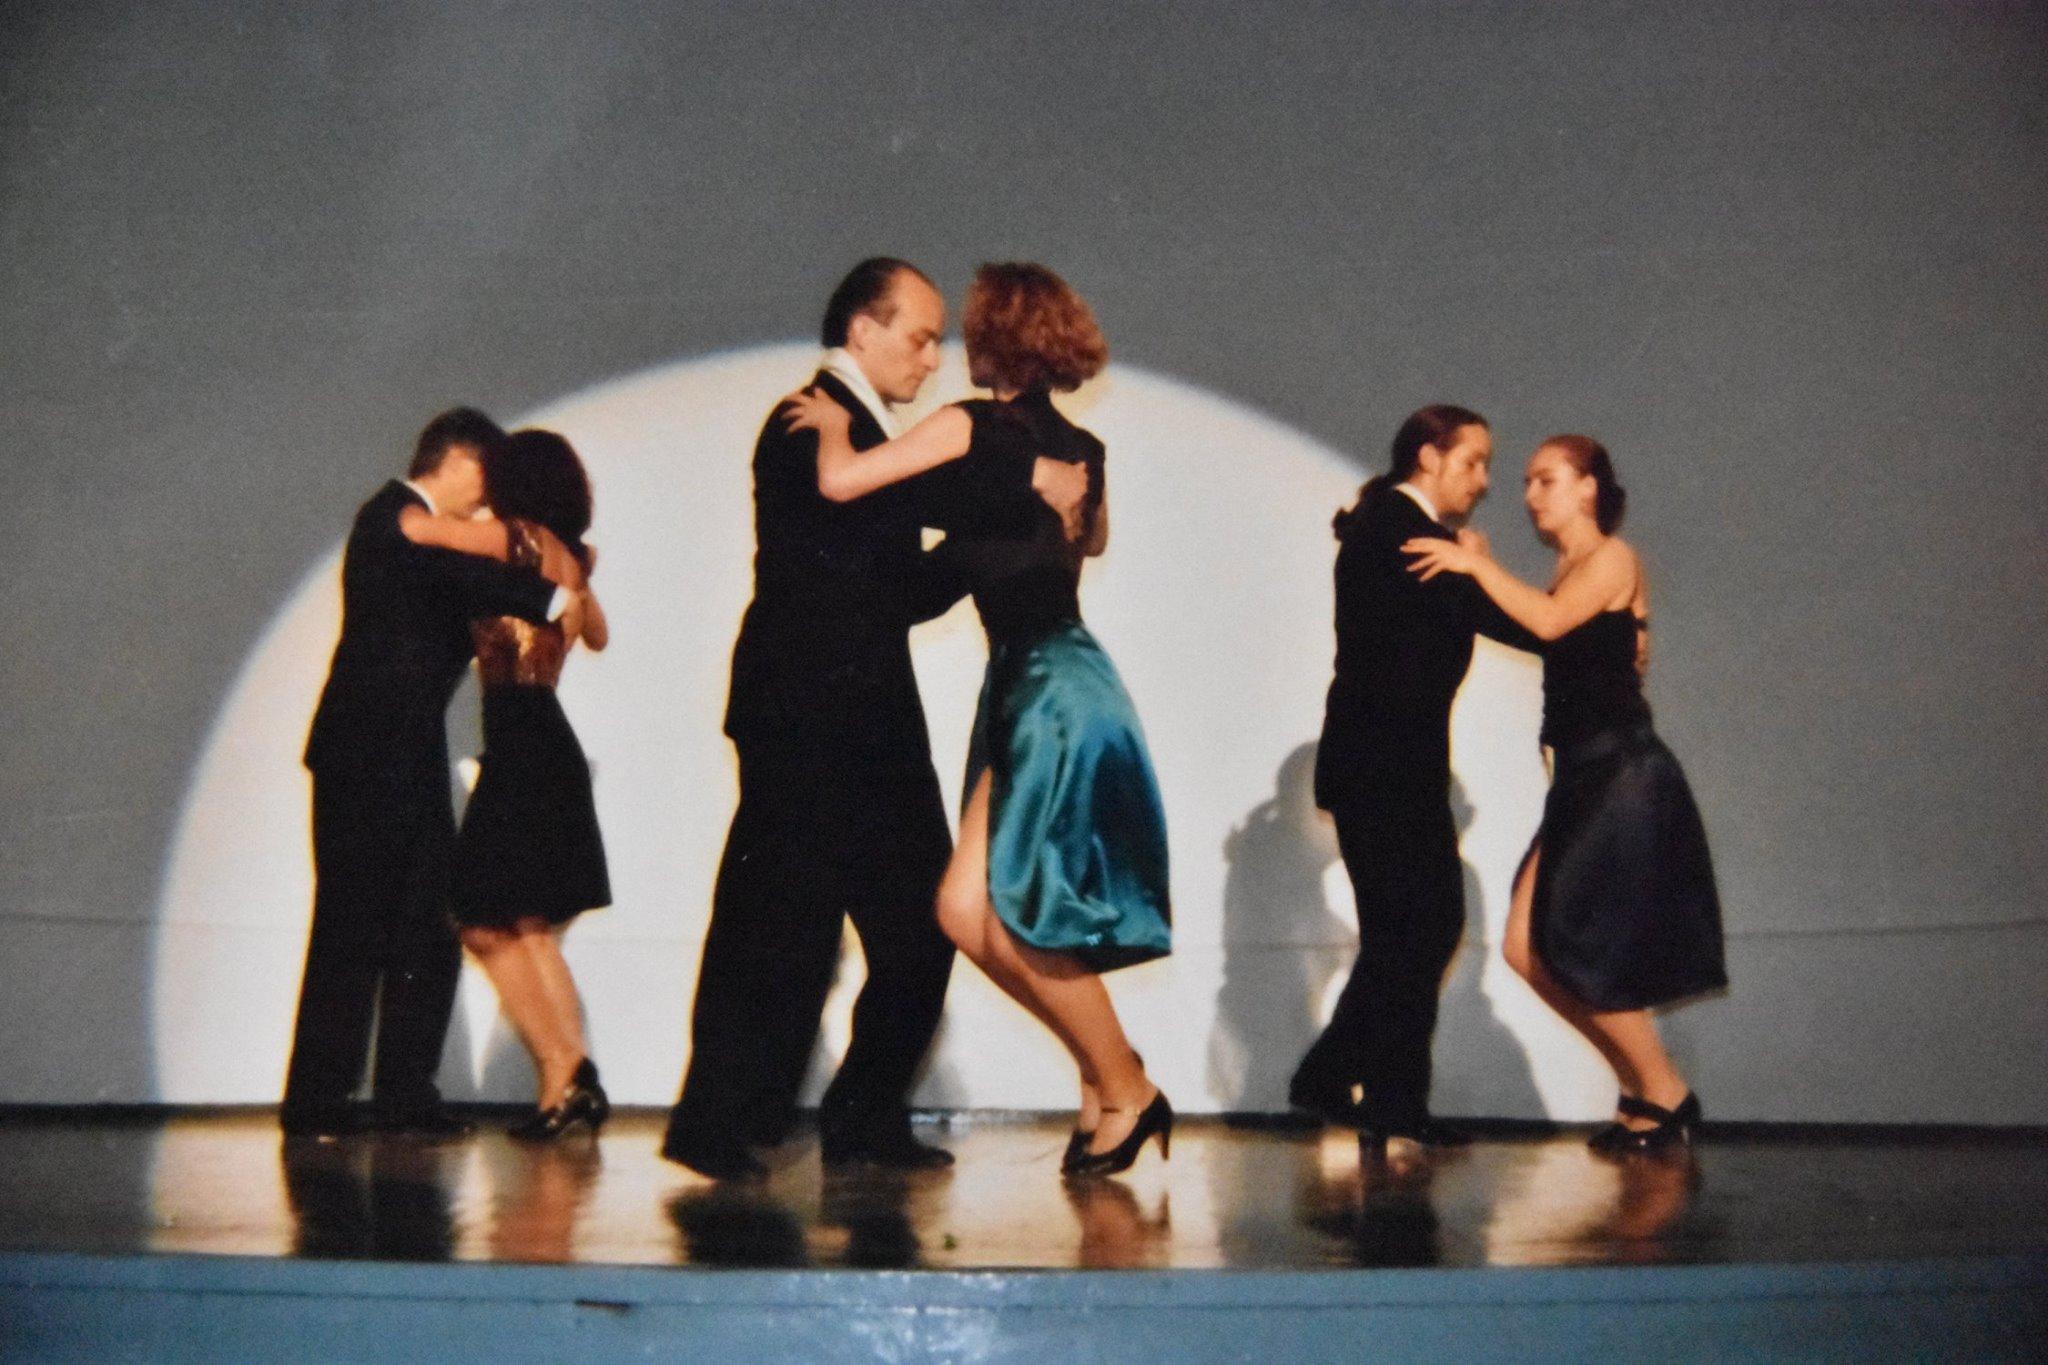 Tango à La Carte Tango Global Tango München Tango Bayern